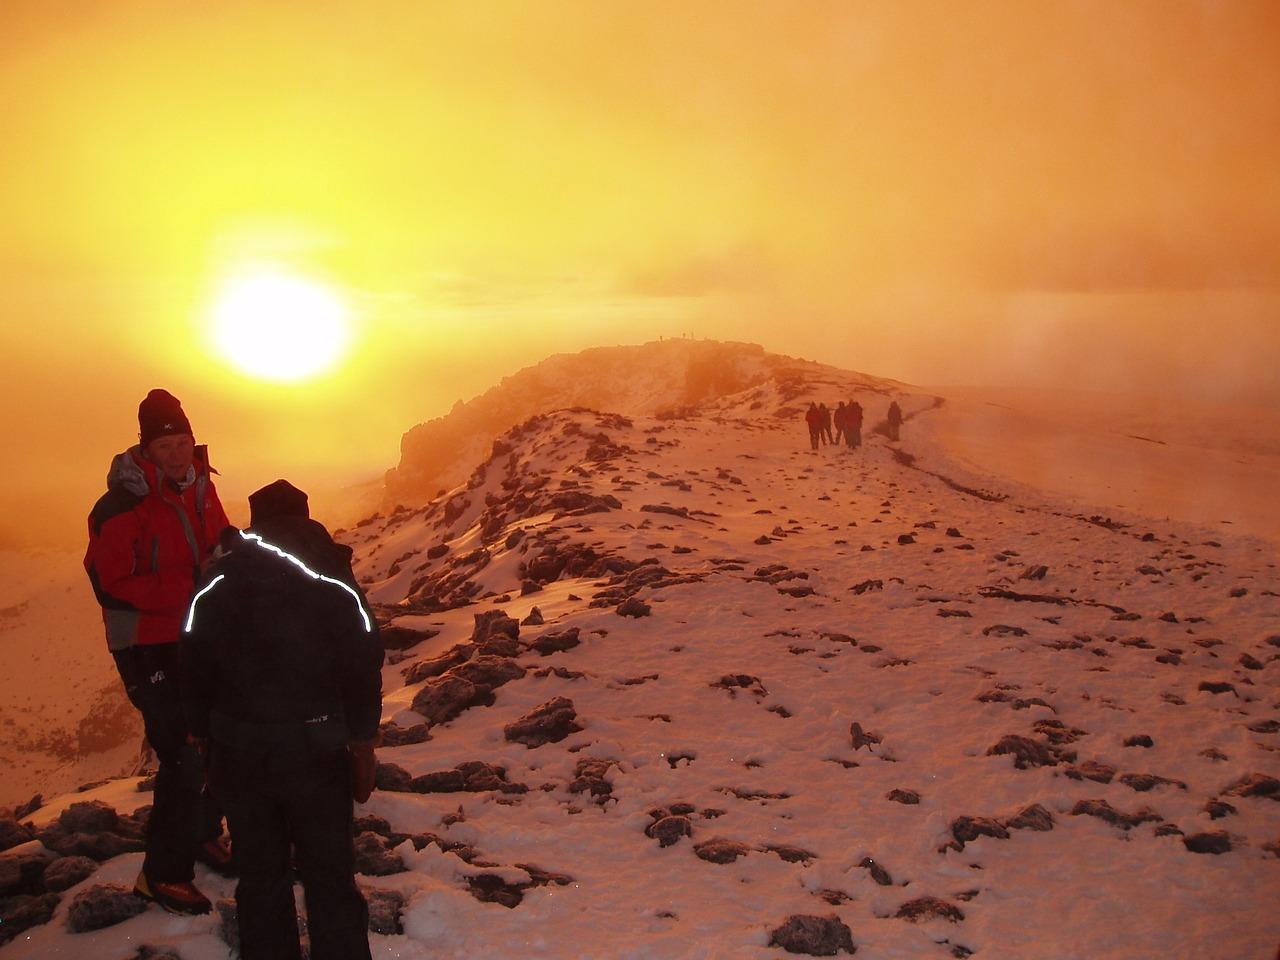 kilimanjaro-1405893_1280.jpg